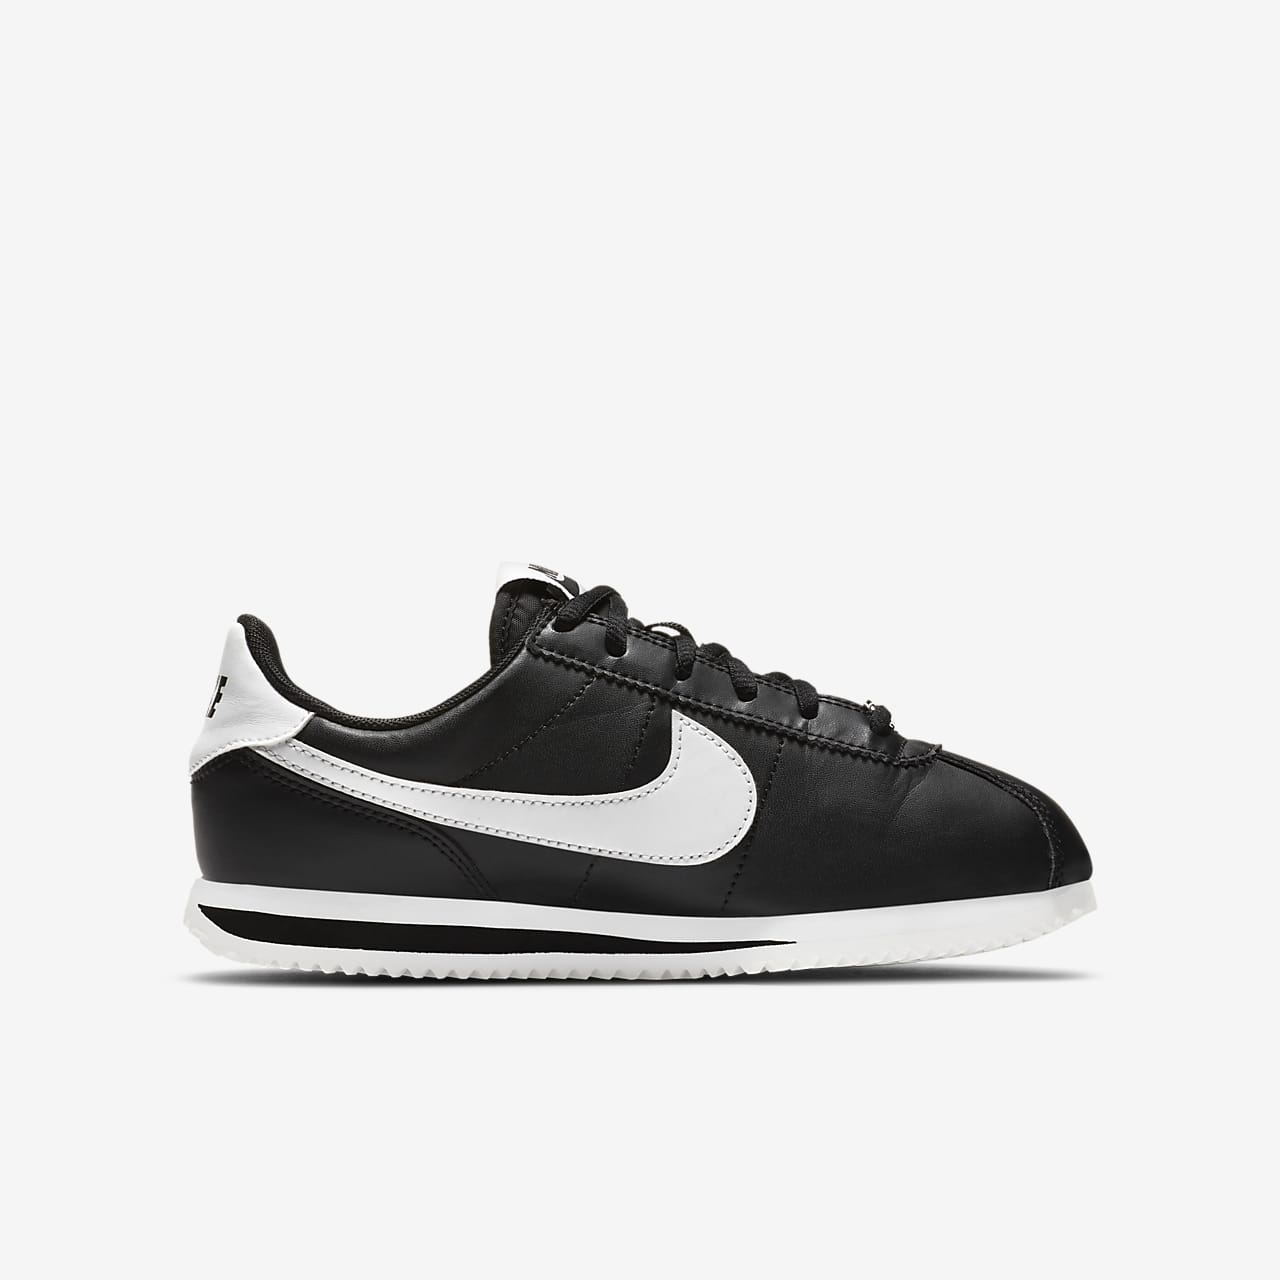 0092a8e4dc2 Nike Cortez Basic SL Older Kids  Shoe. Nike.com GB